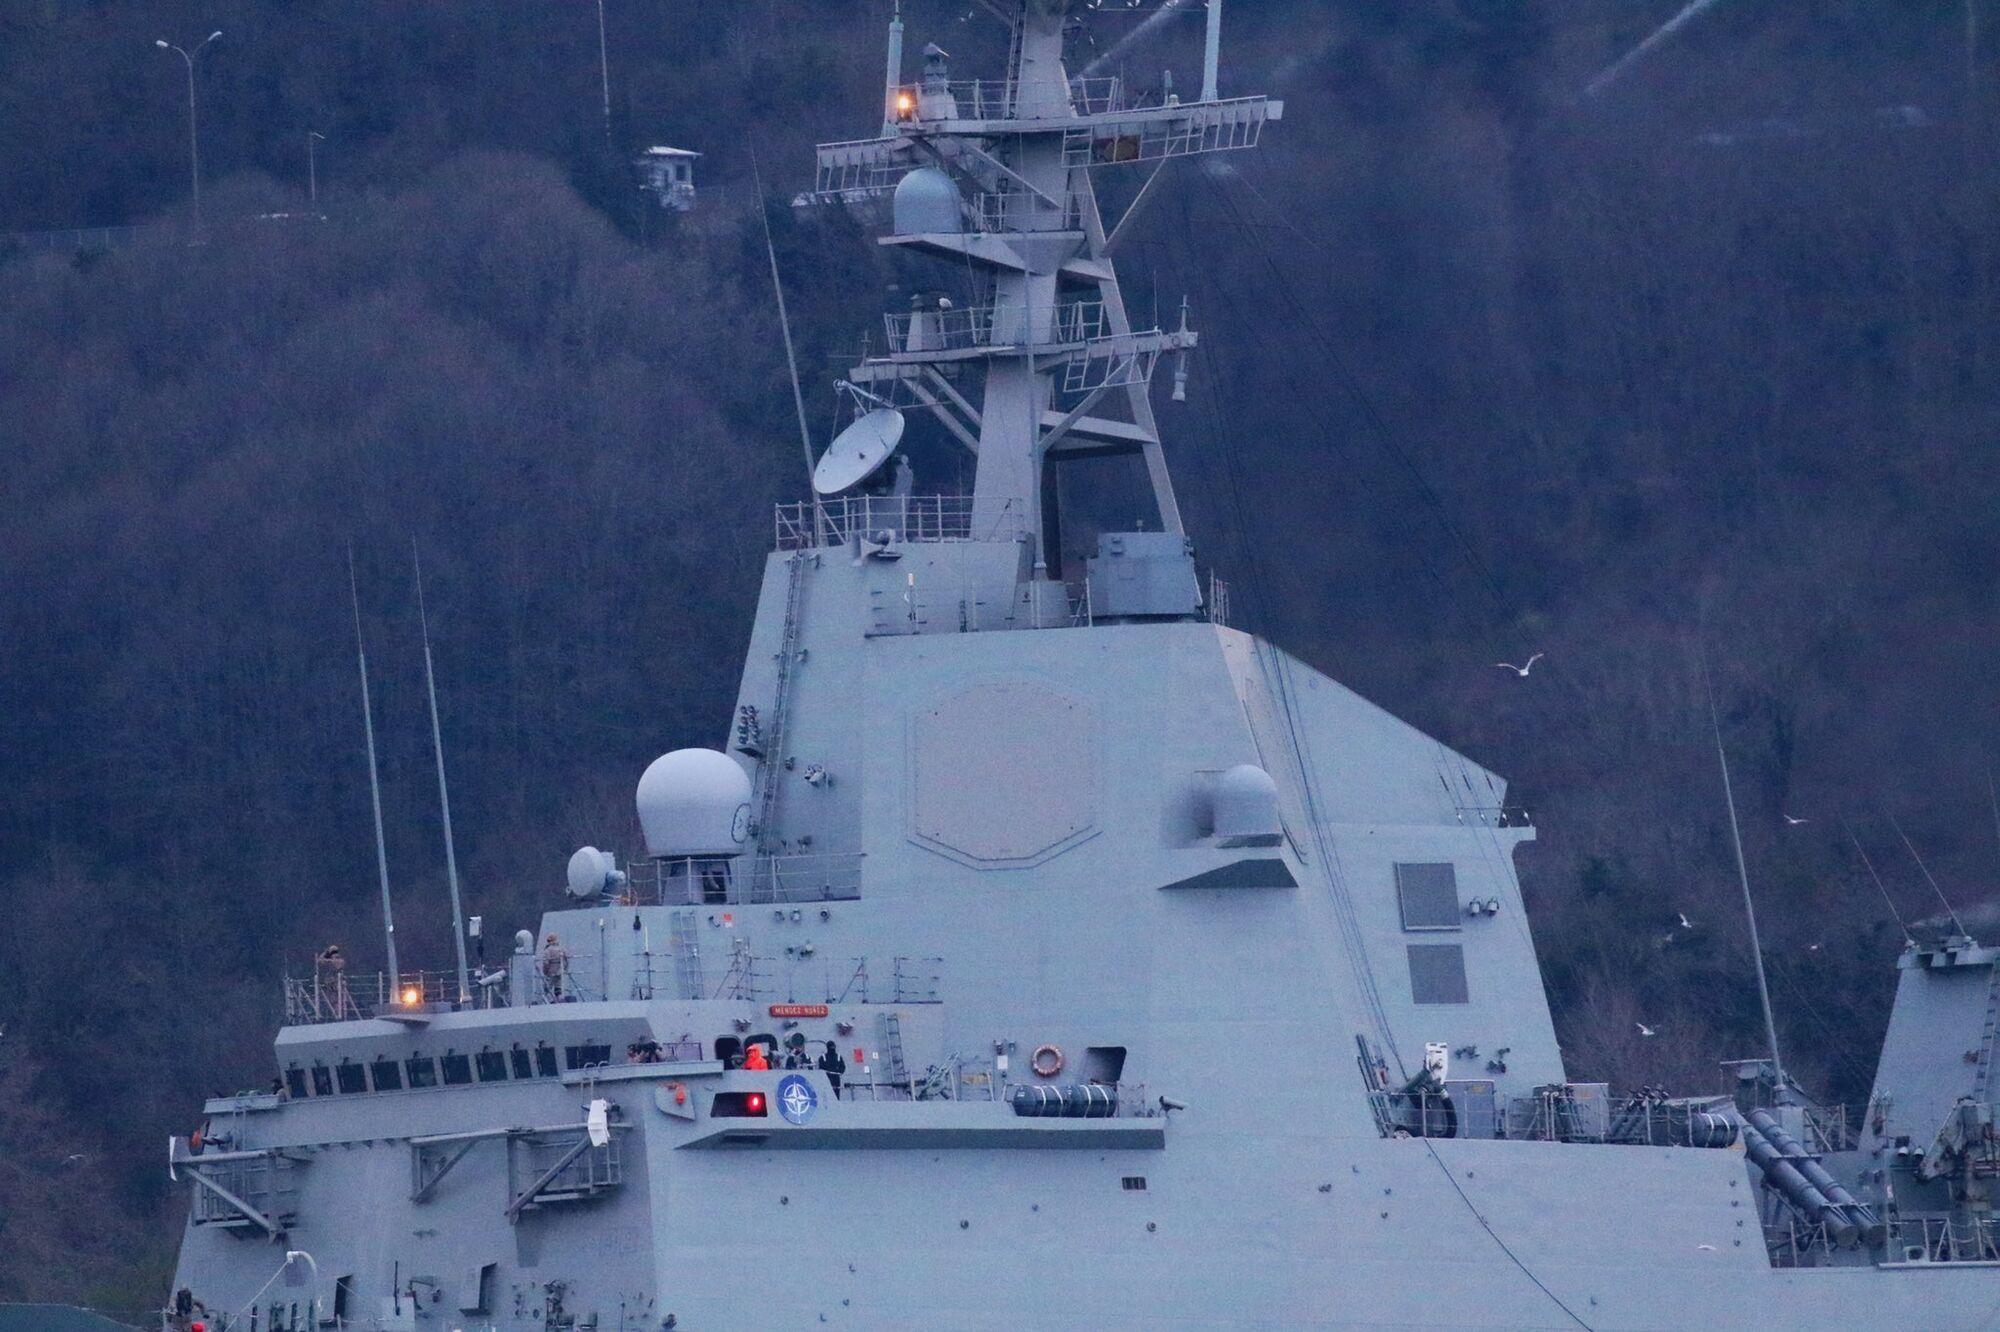 Іспанський корабель НАТО Mendez Nuñez пройшов Босфор